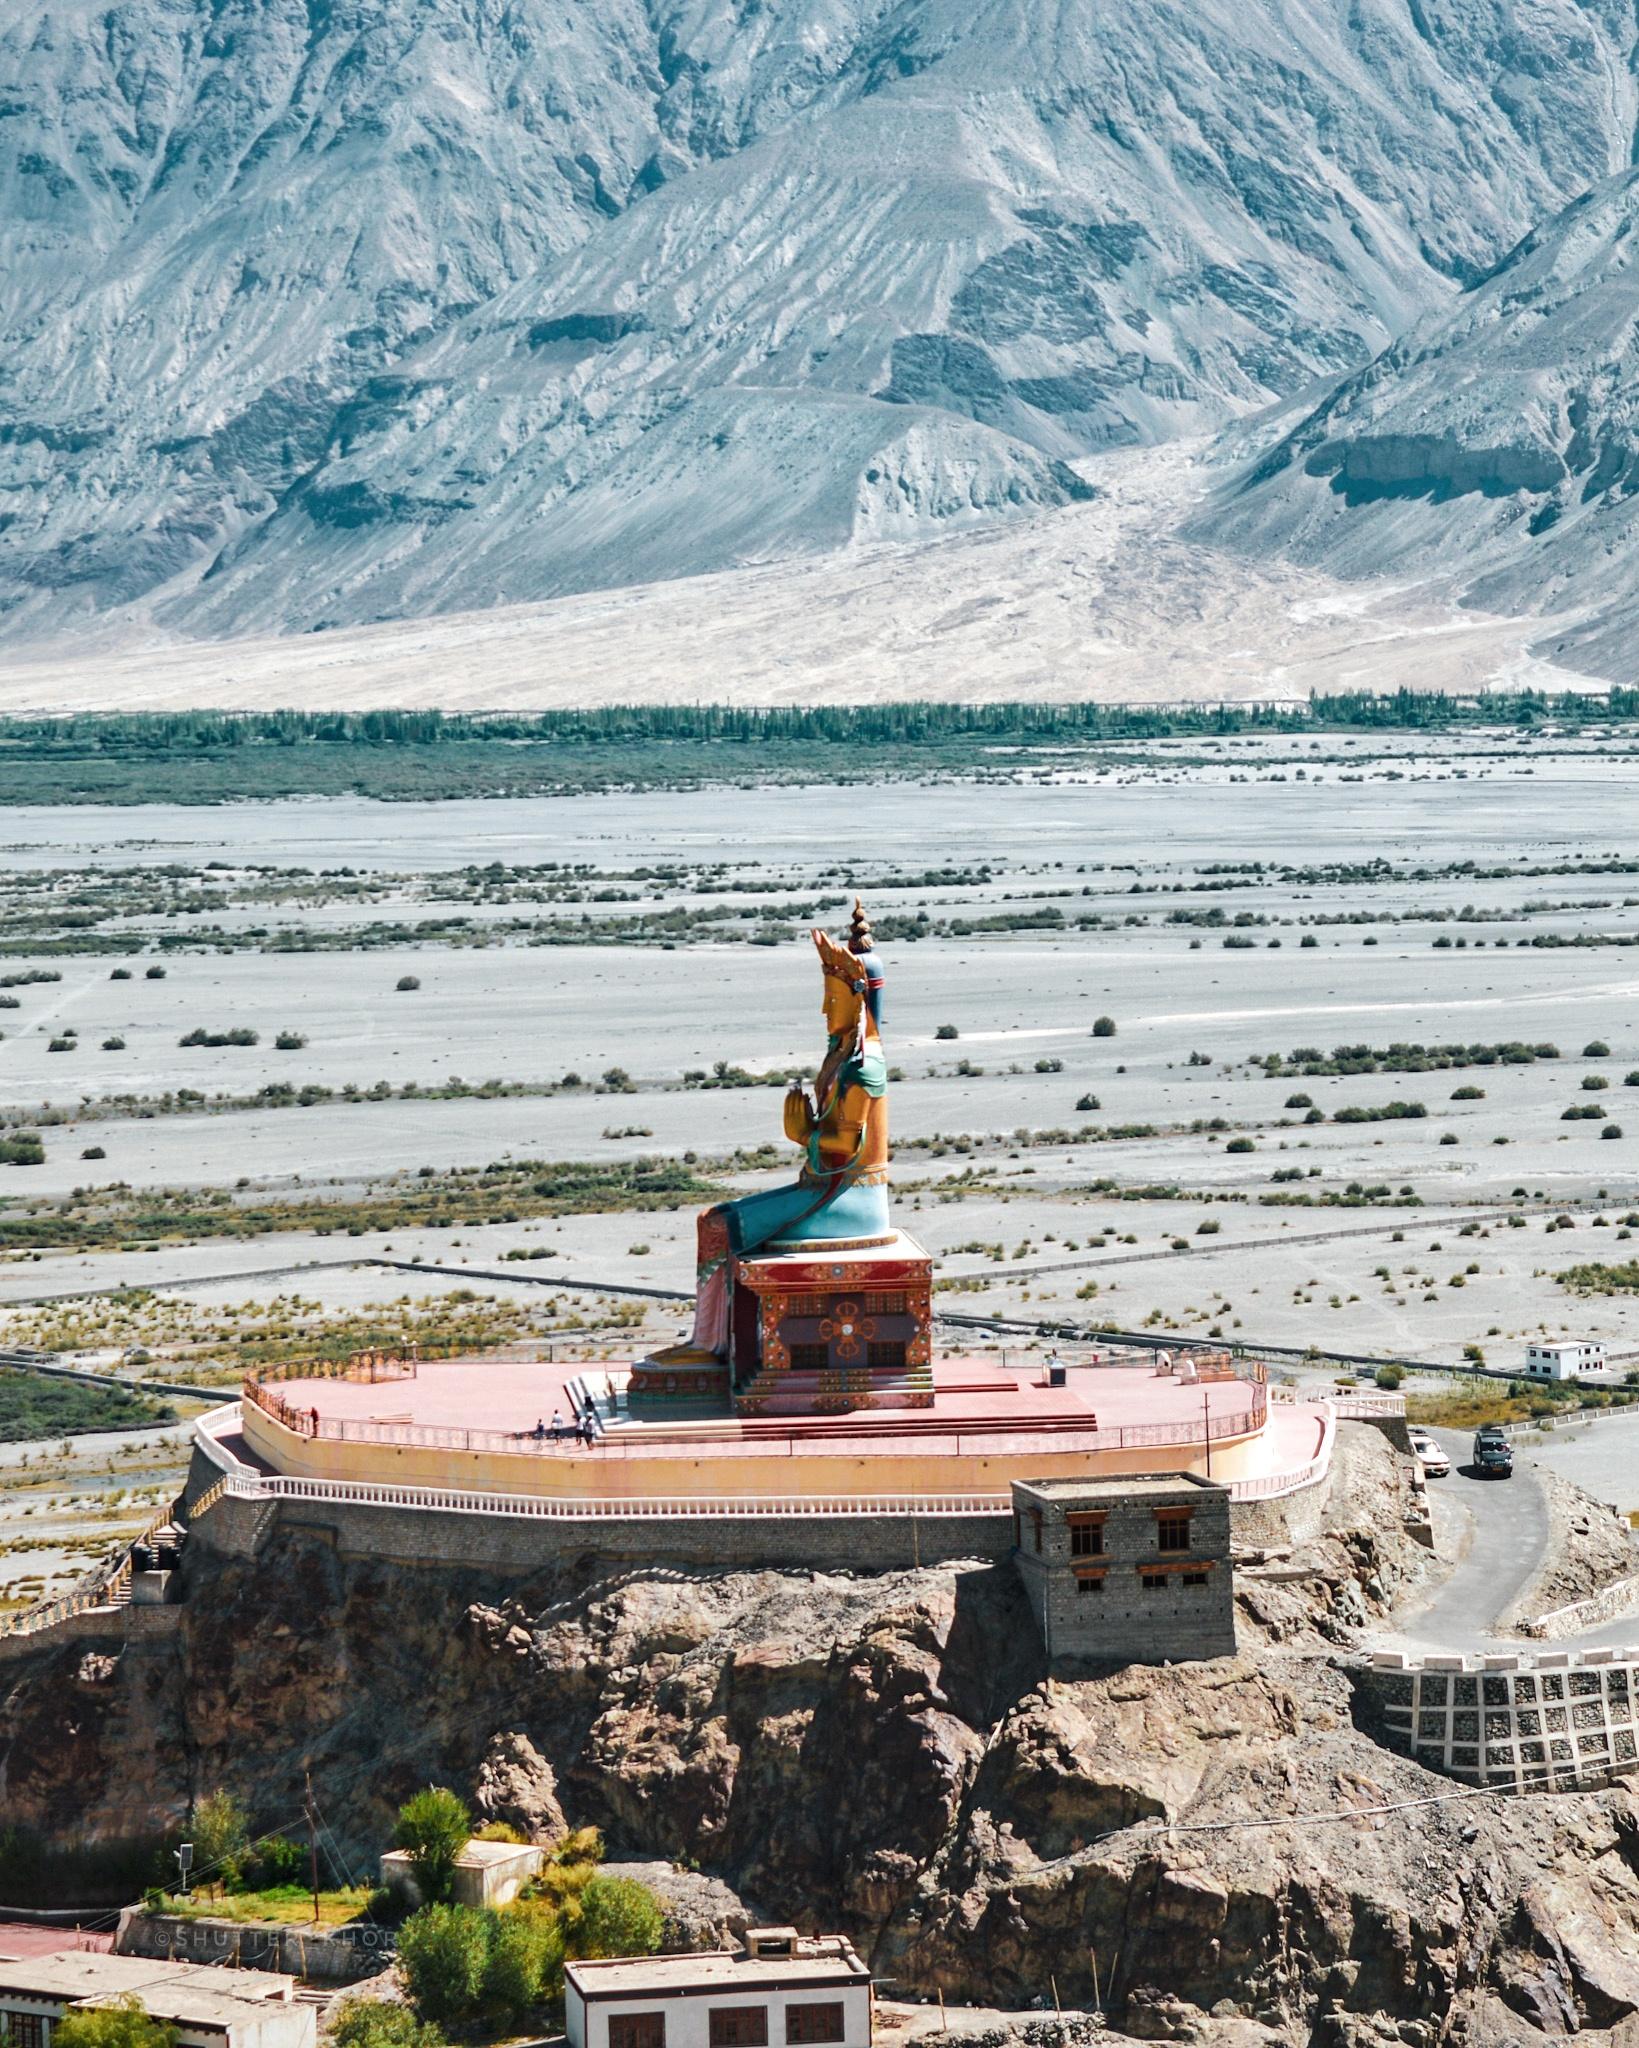 Diskit Monastery in the Nubra Valley of Ladakh